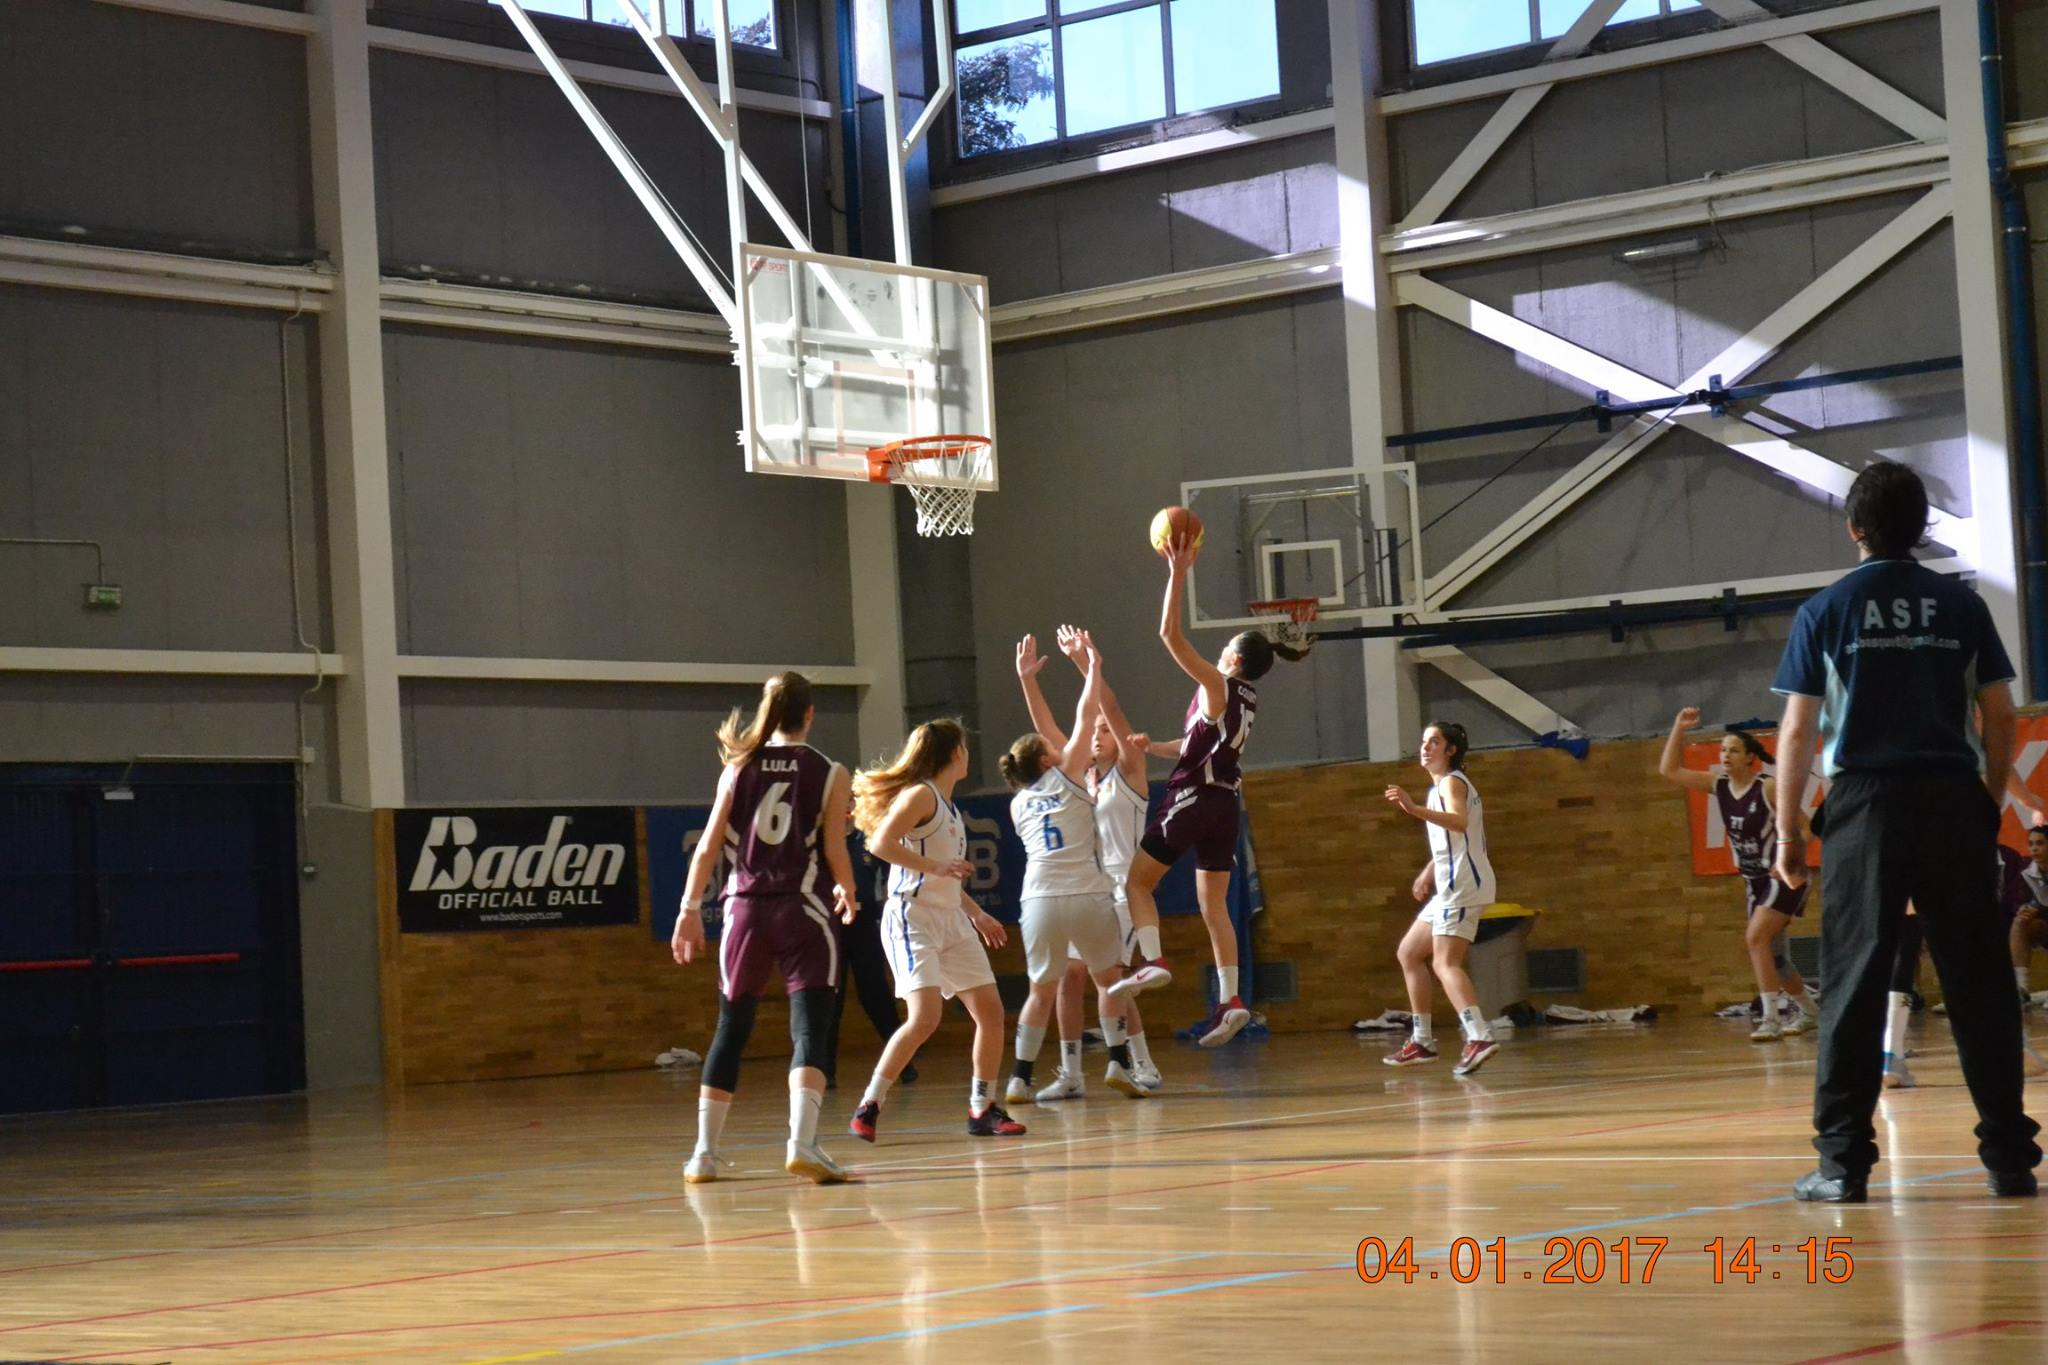 Israel Basketball Asociation vs B.F. Sant Adrià